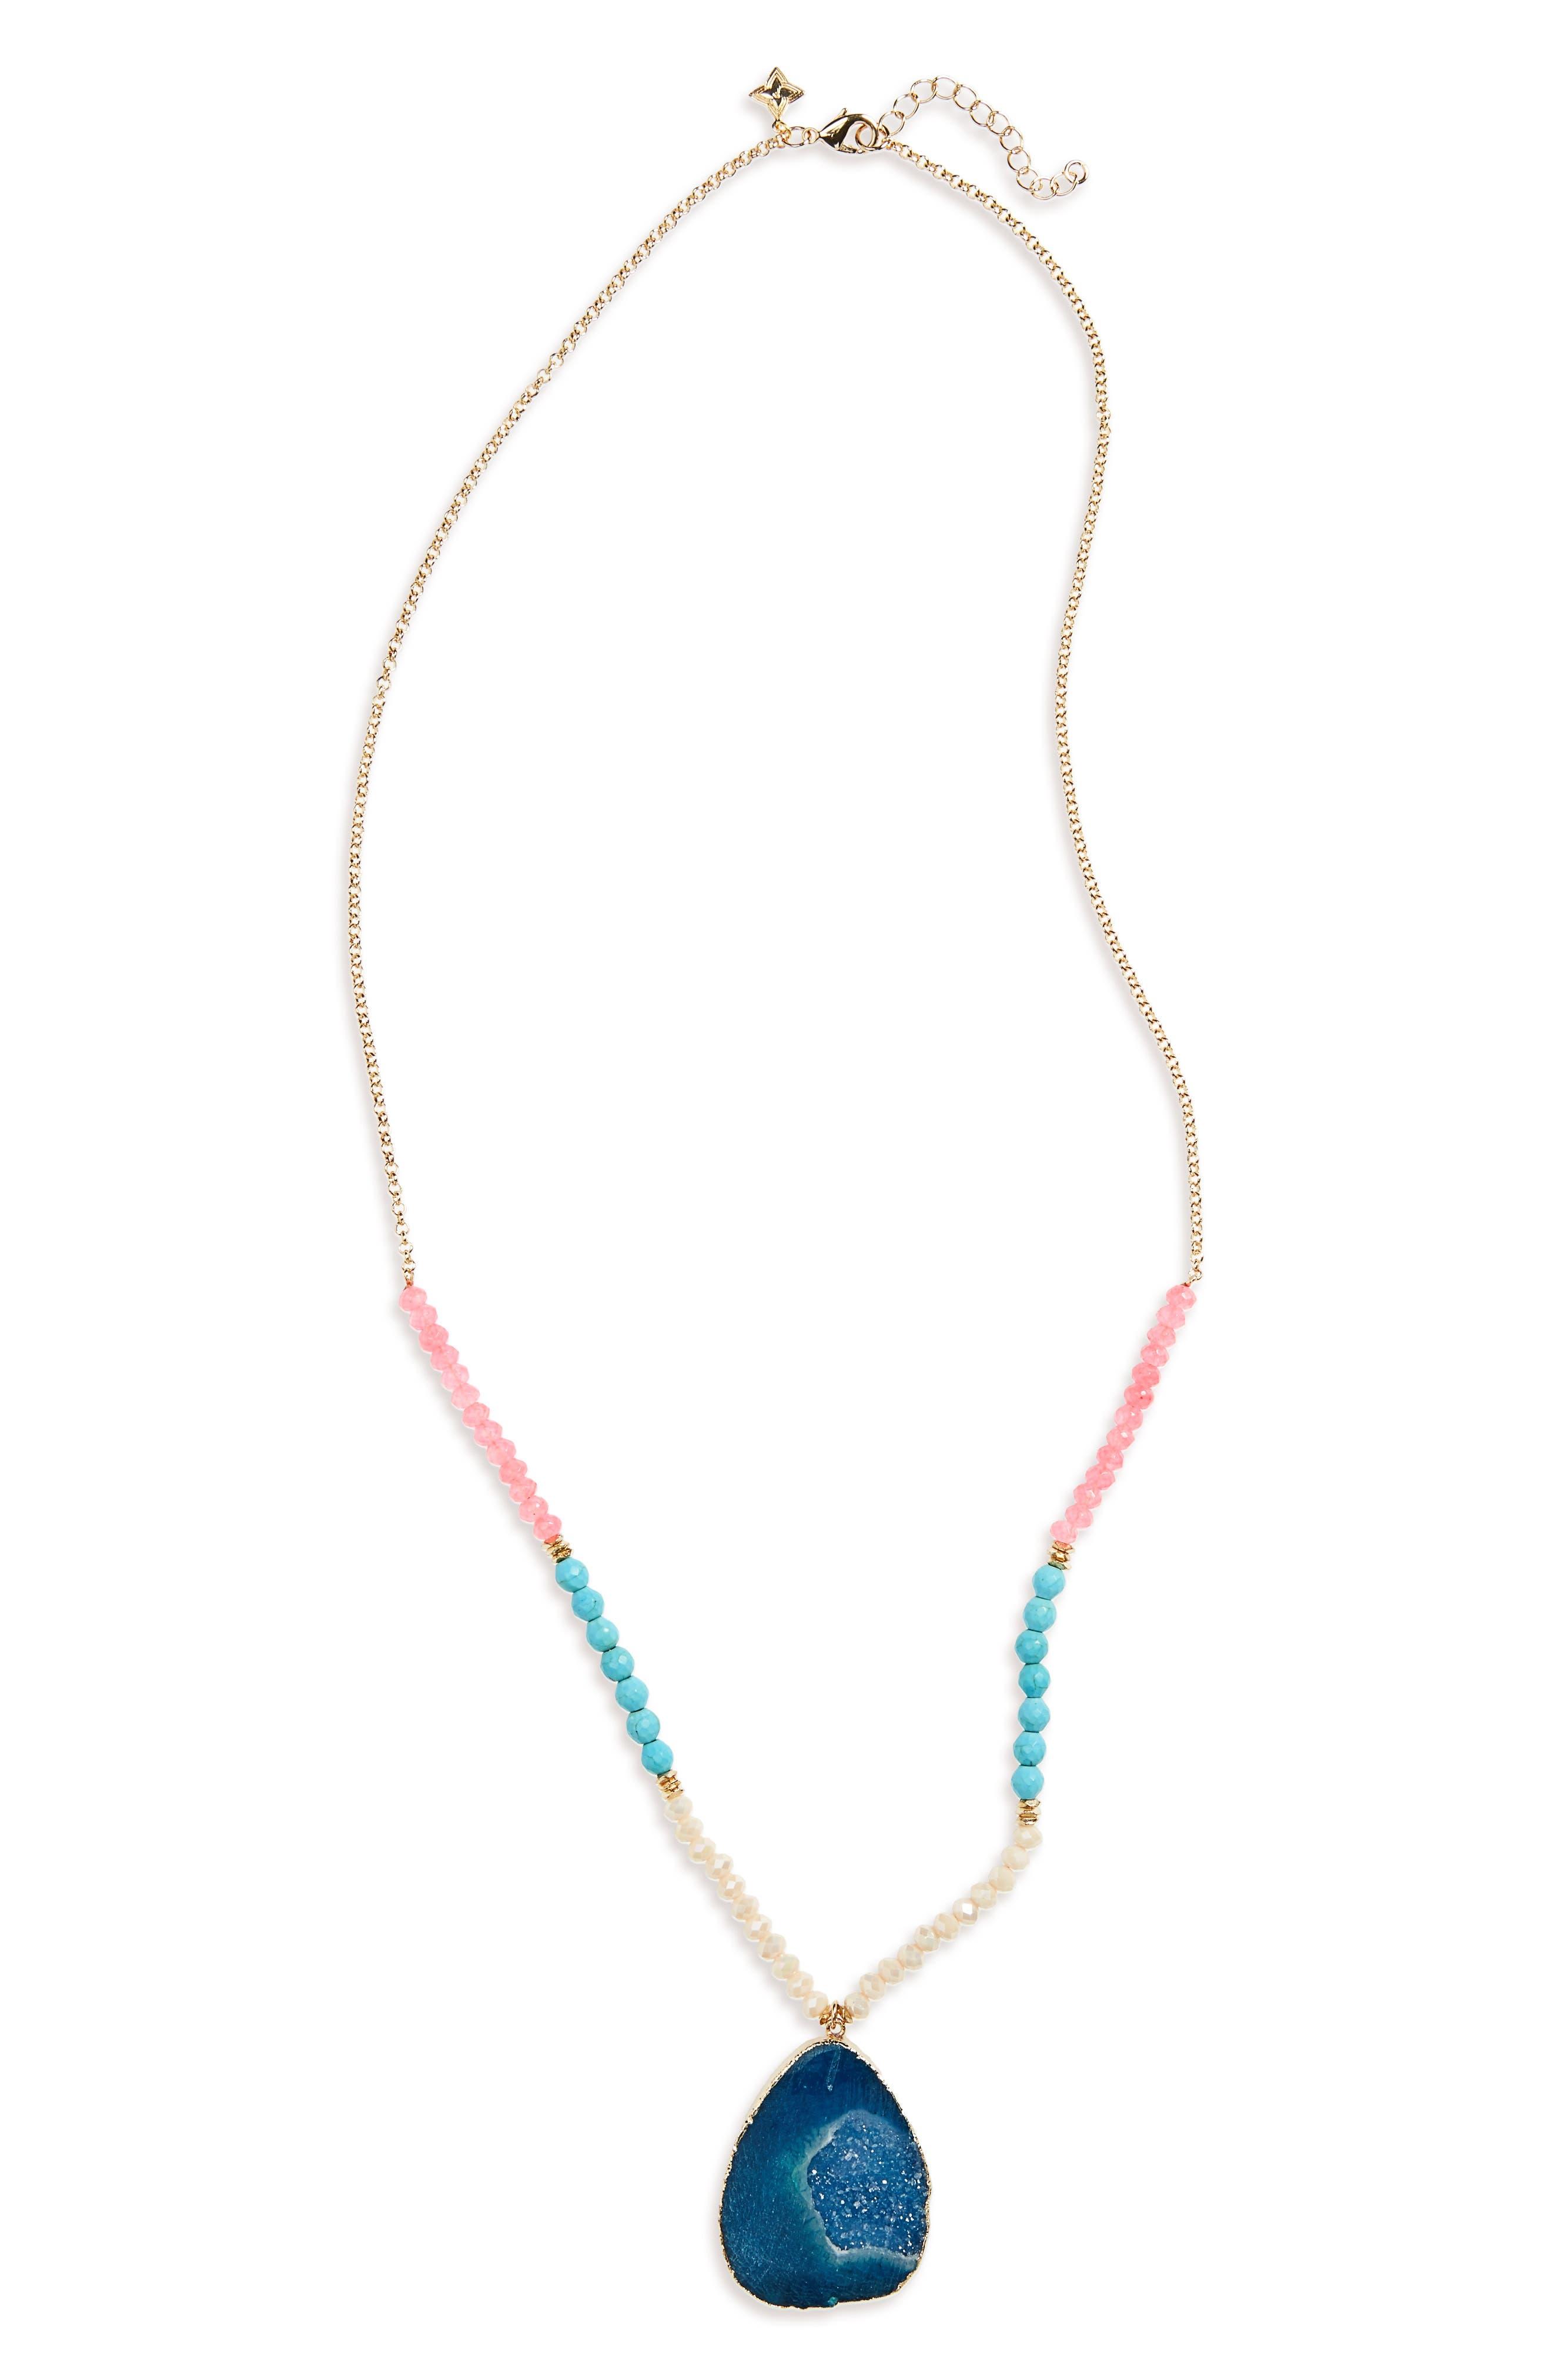 Panacea Stone Pendant Necklace